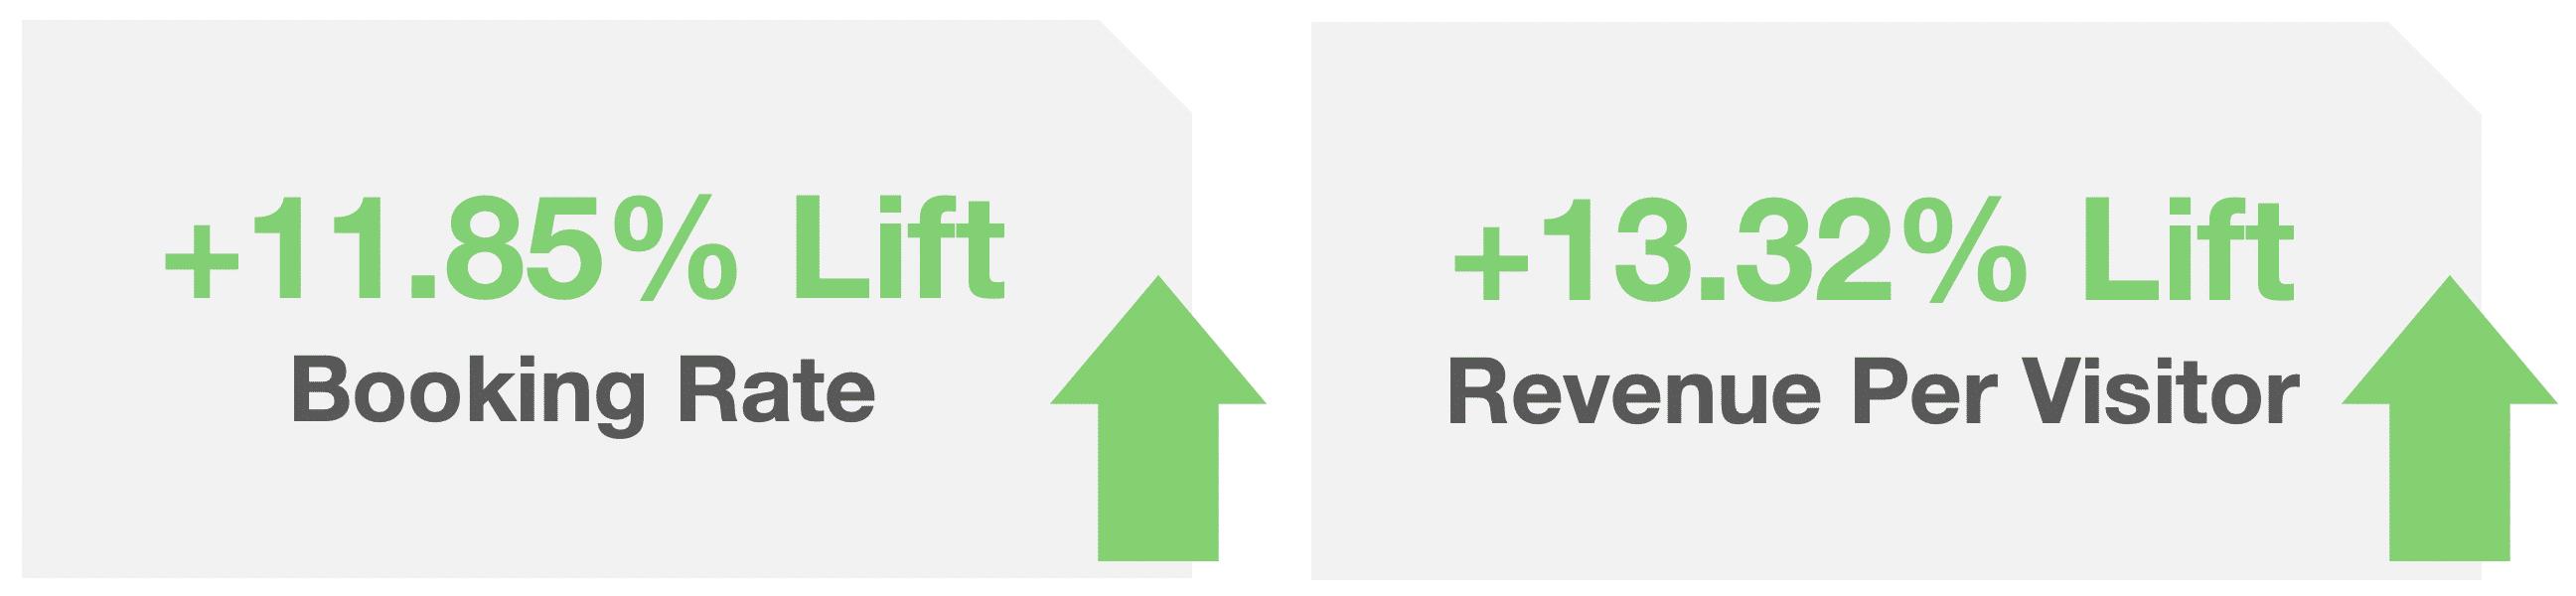 image representing increases in booking & revenue